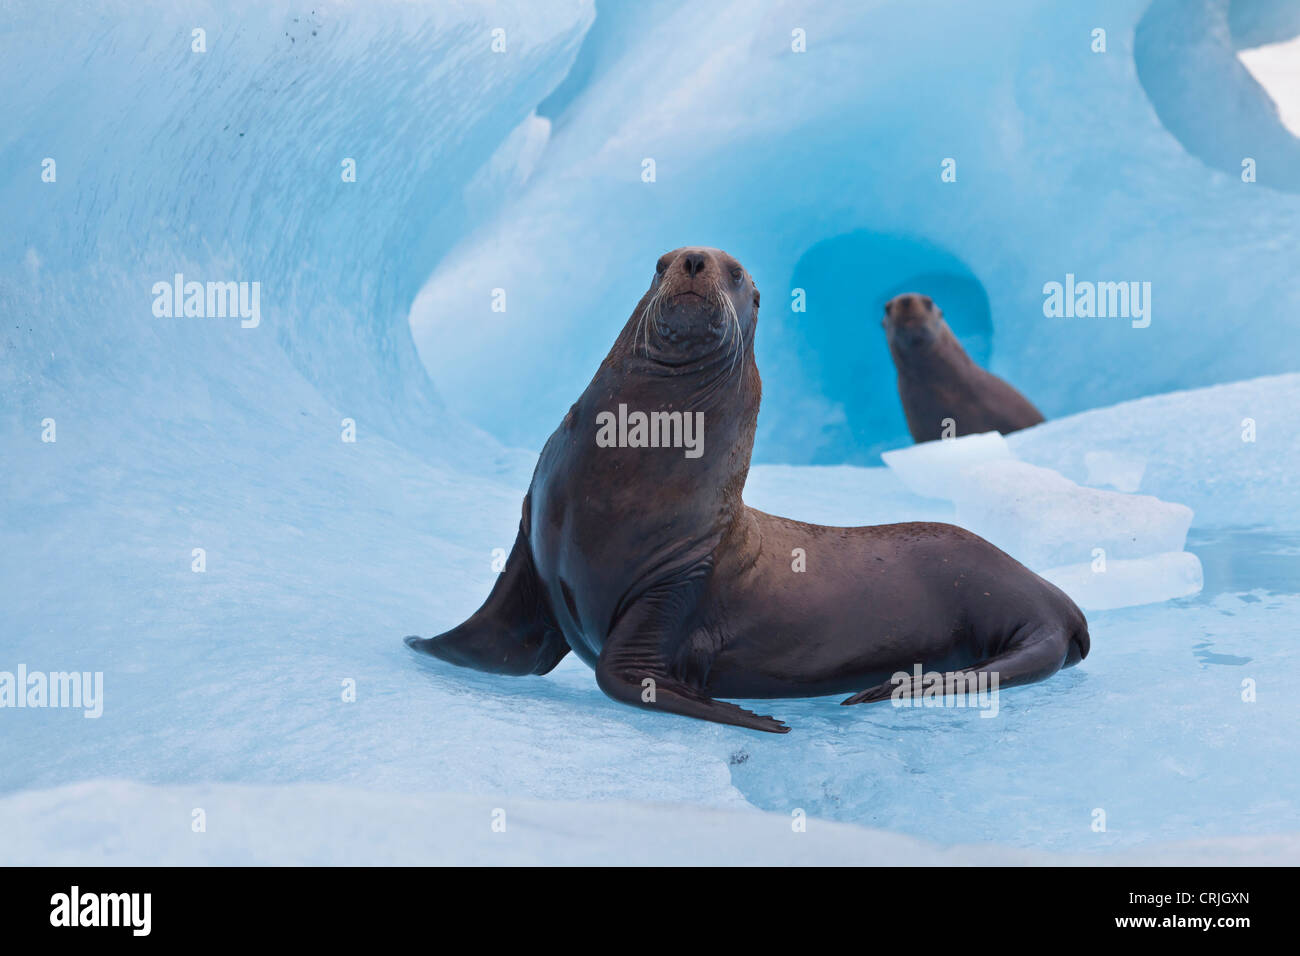 Prince William Sound, Alaska, a pair of playful stellar sea lions wrestle on a blue iceberg near Bull Head. - Stock Image